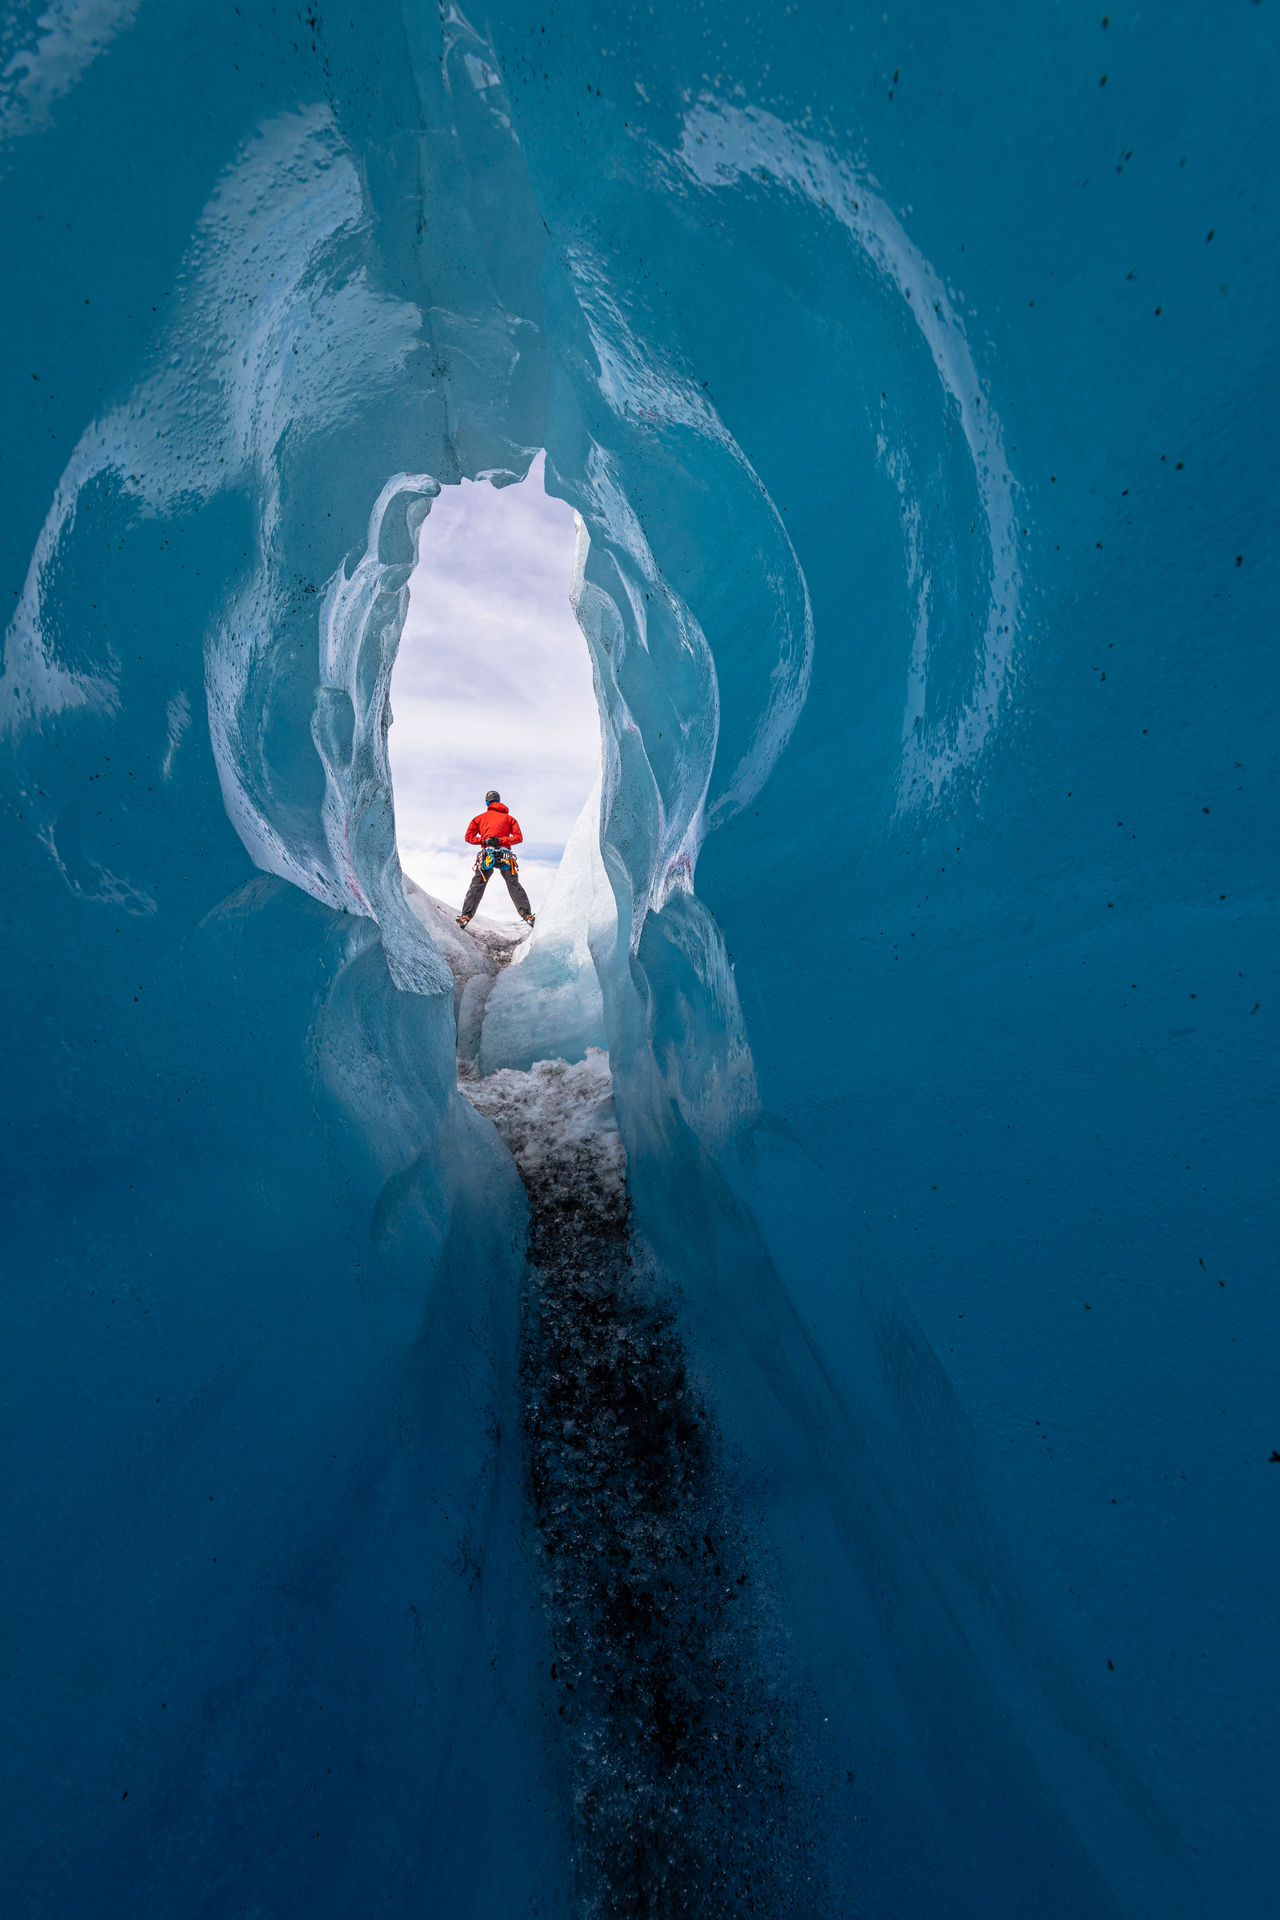 Man standing on glacier